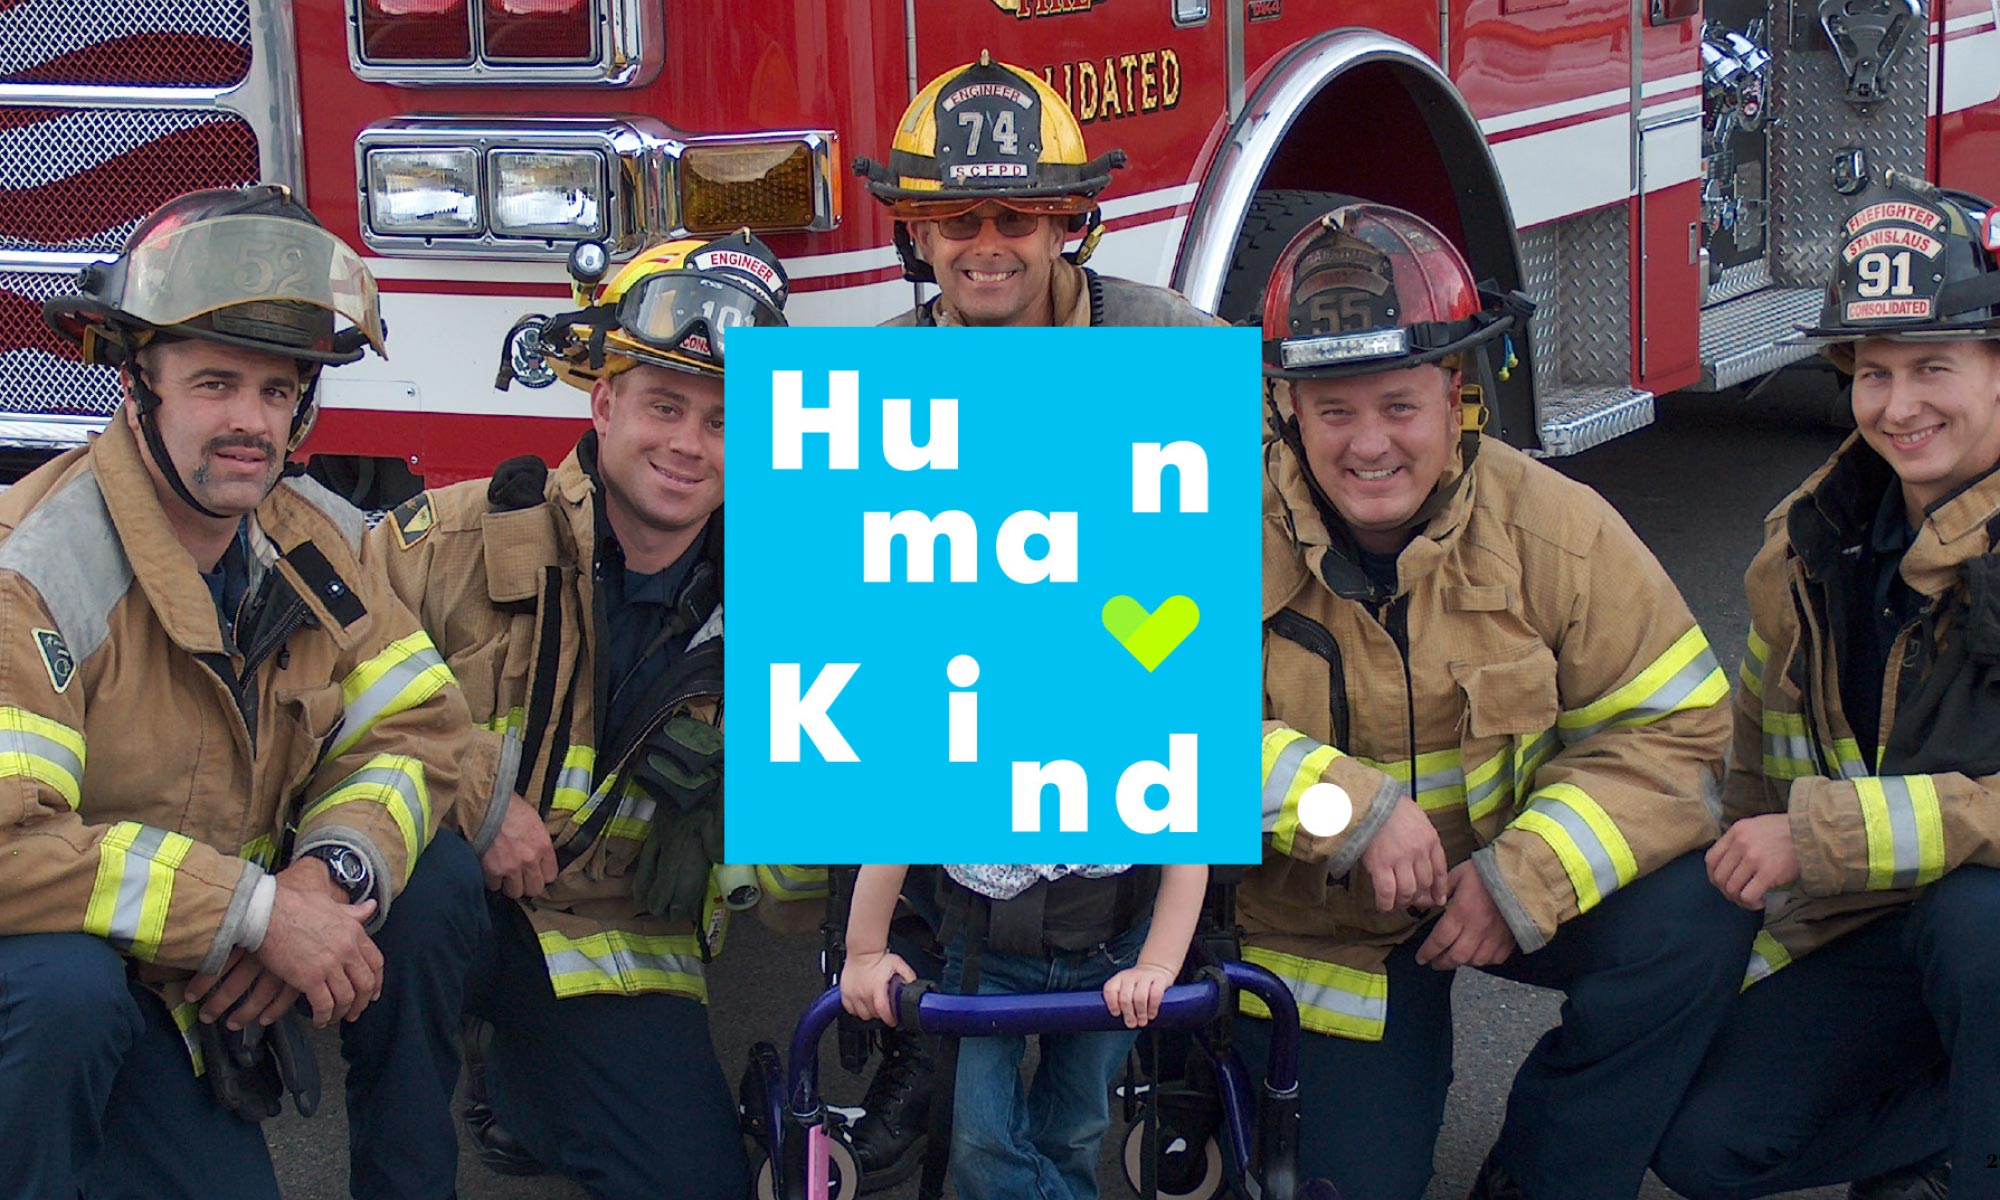 humankind usa today branding motto branding